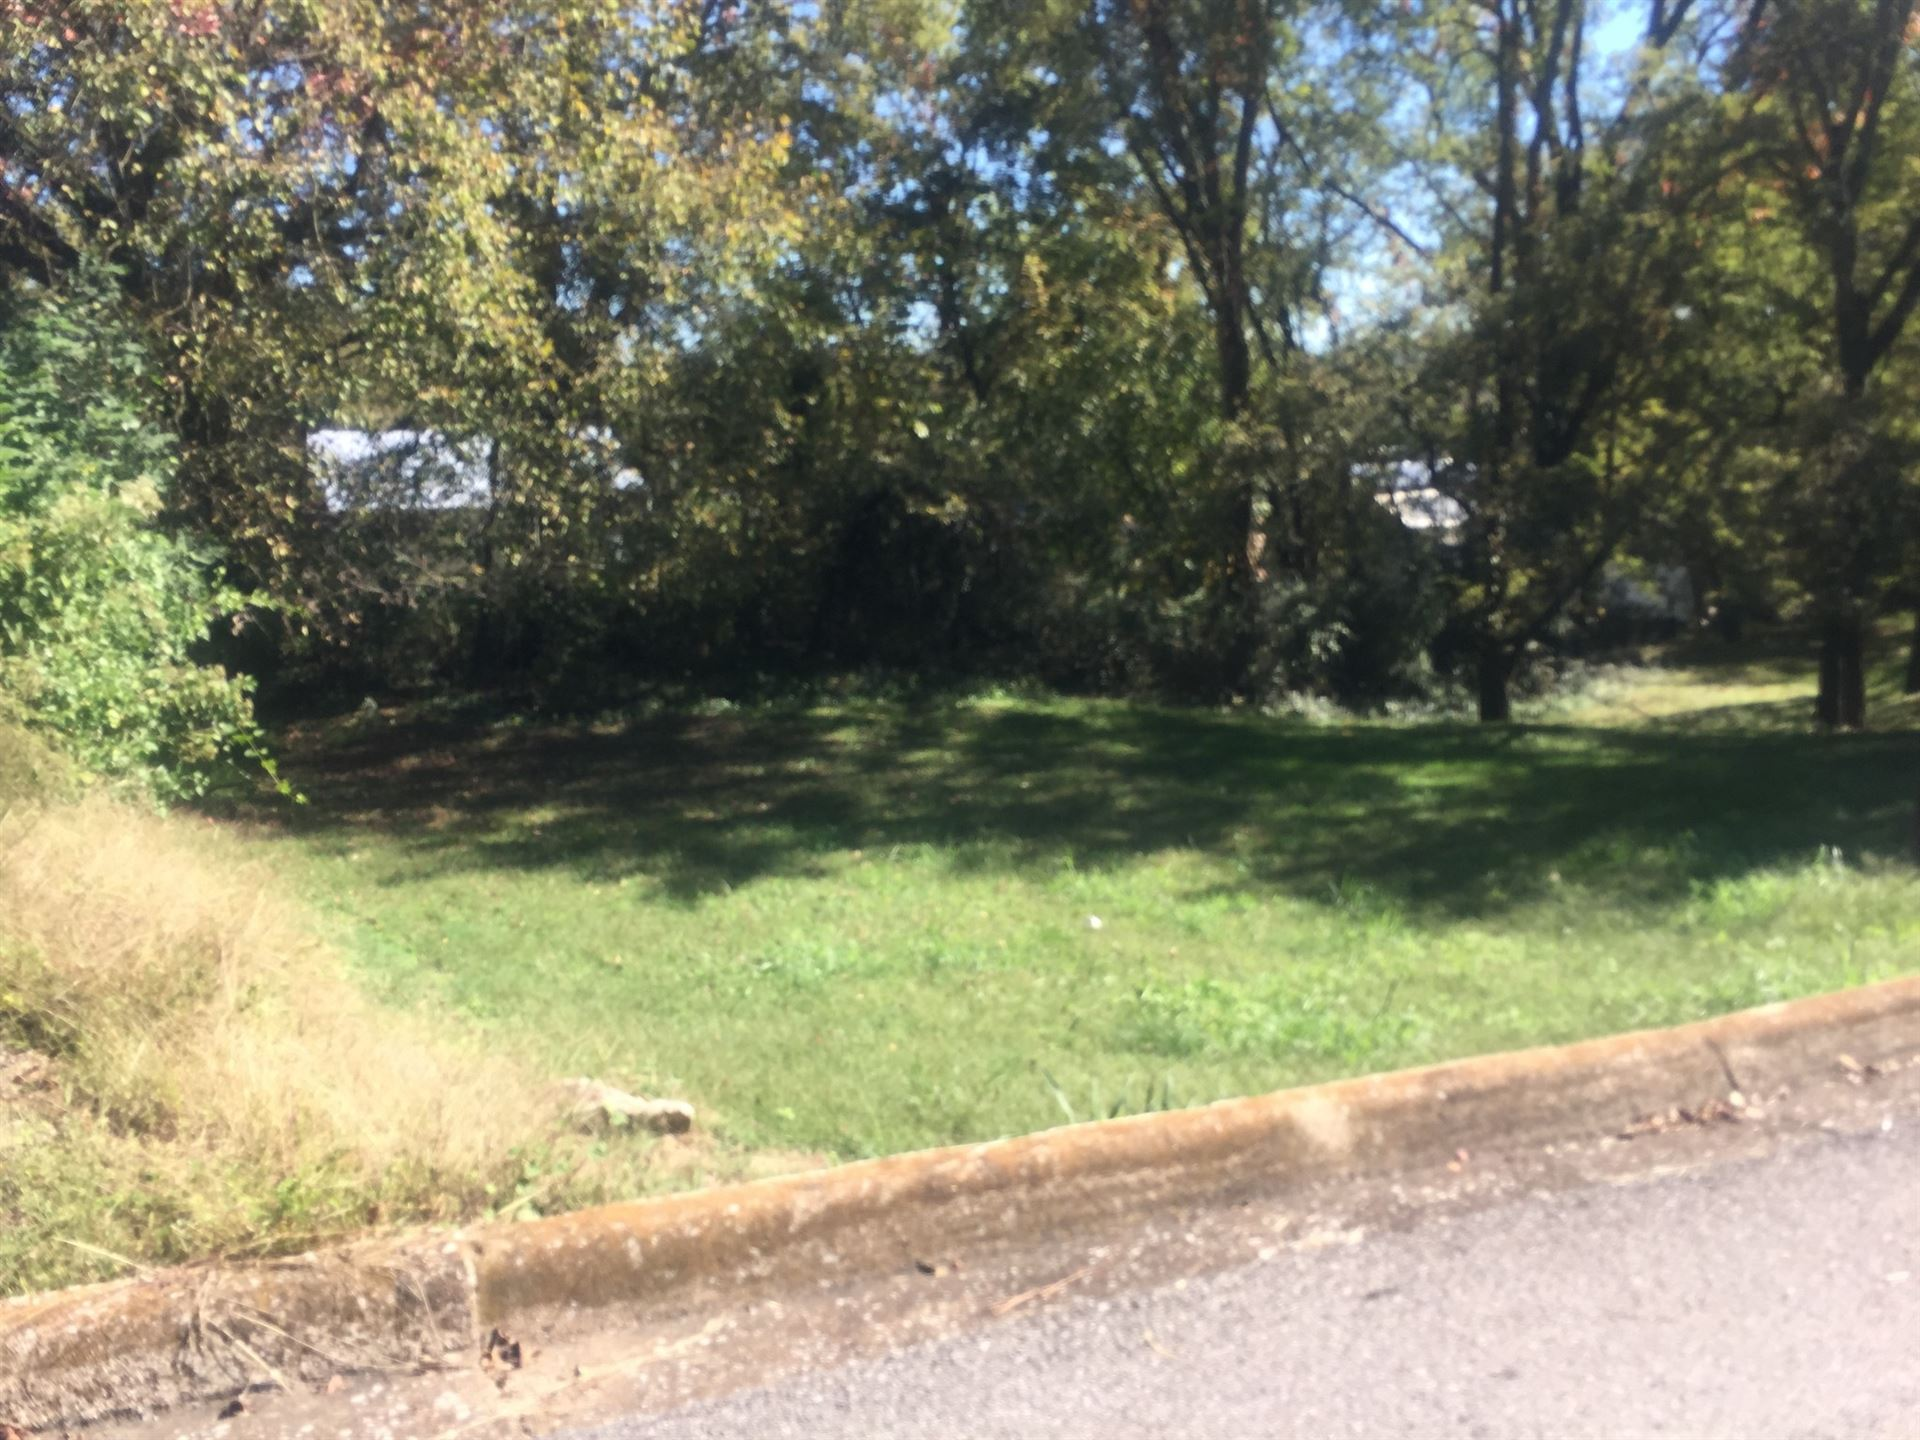 Photo of 0 McGrew St, Pulaski, TN 38478 (MLS # 2198277)